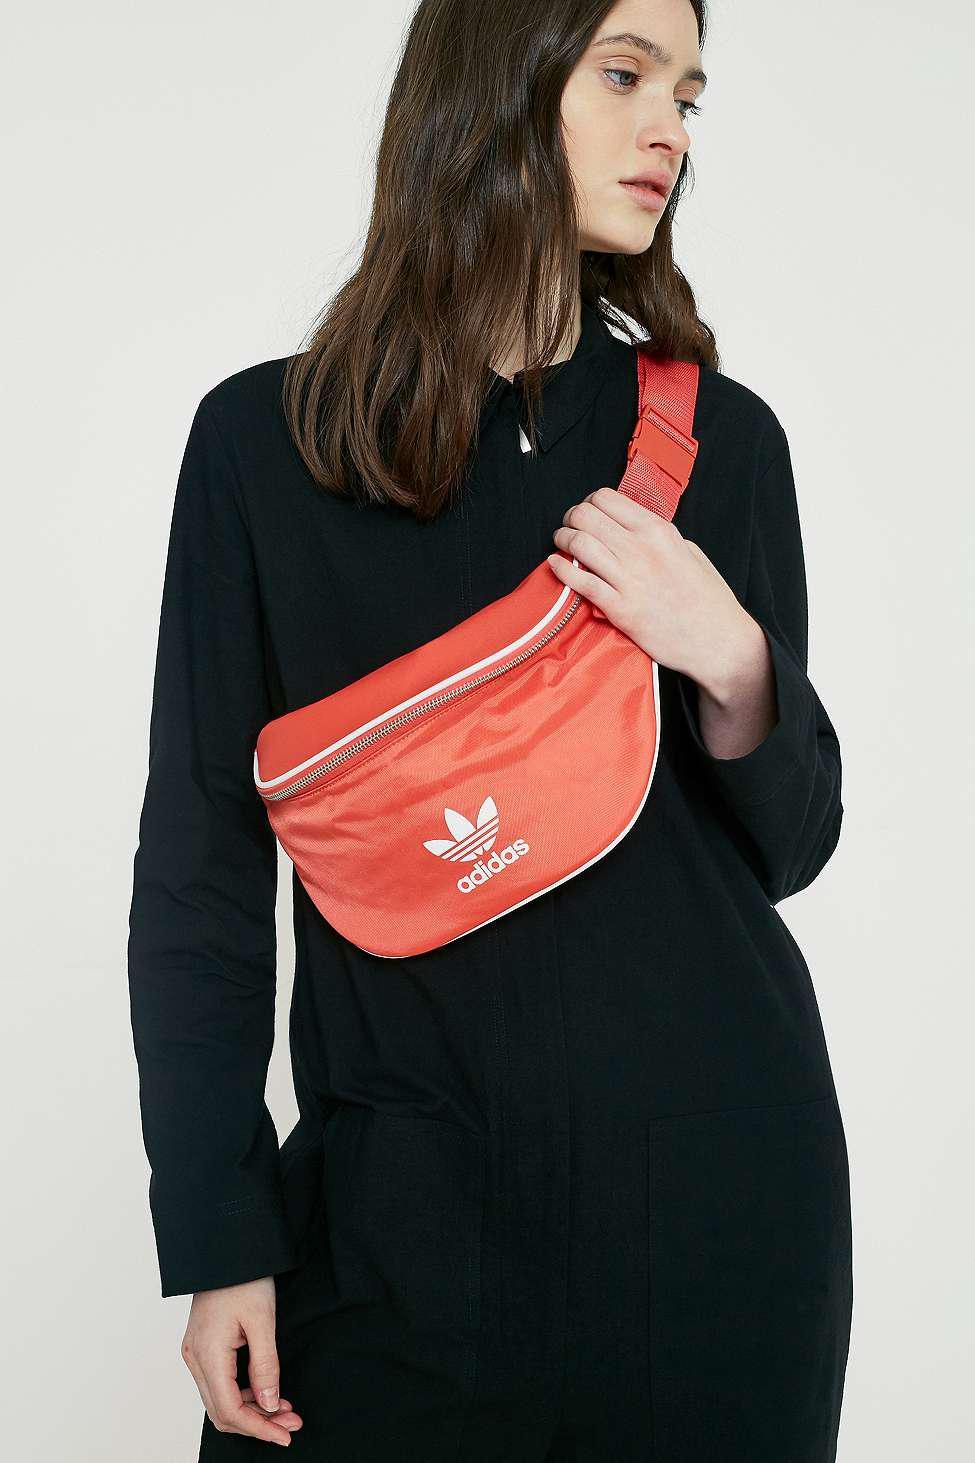 9a367af31f70 adidas Originals Red Logo Crossbody Bag - Womens All in Red - Lyst